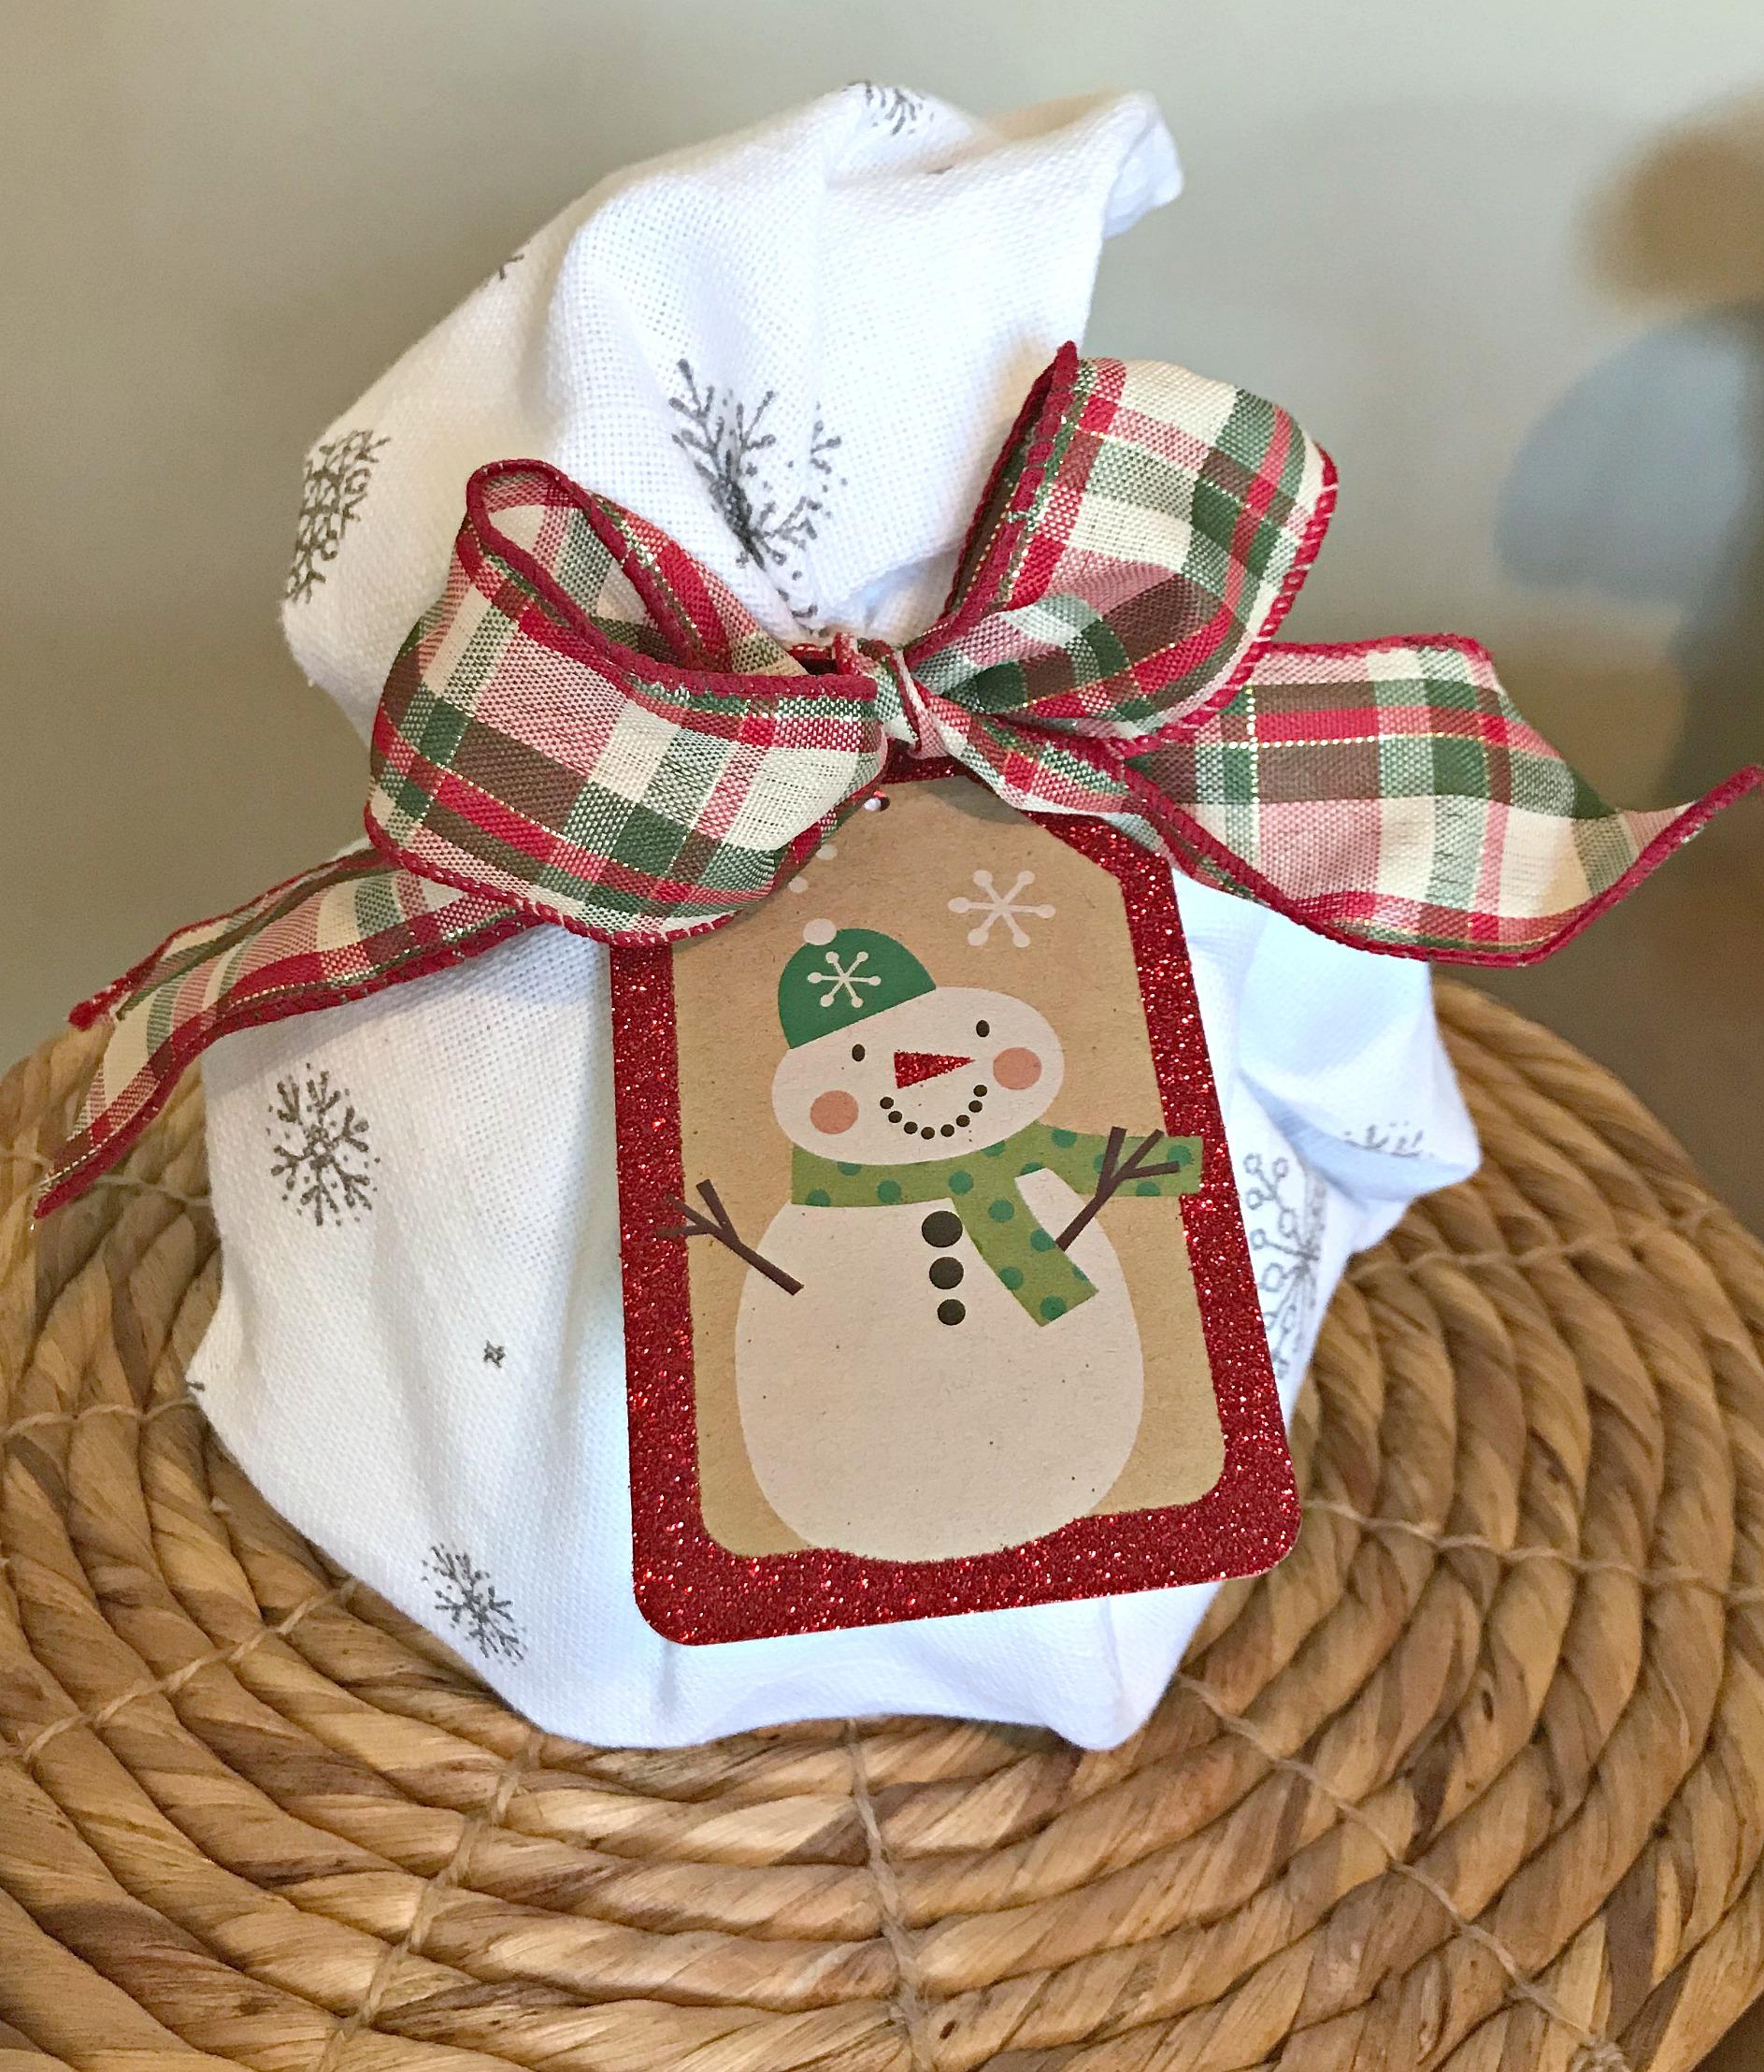 Hostess Gift Idea | Food Gift | Homemade Granola – Come Home For Comfort